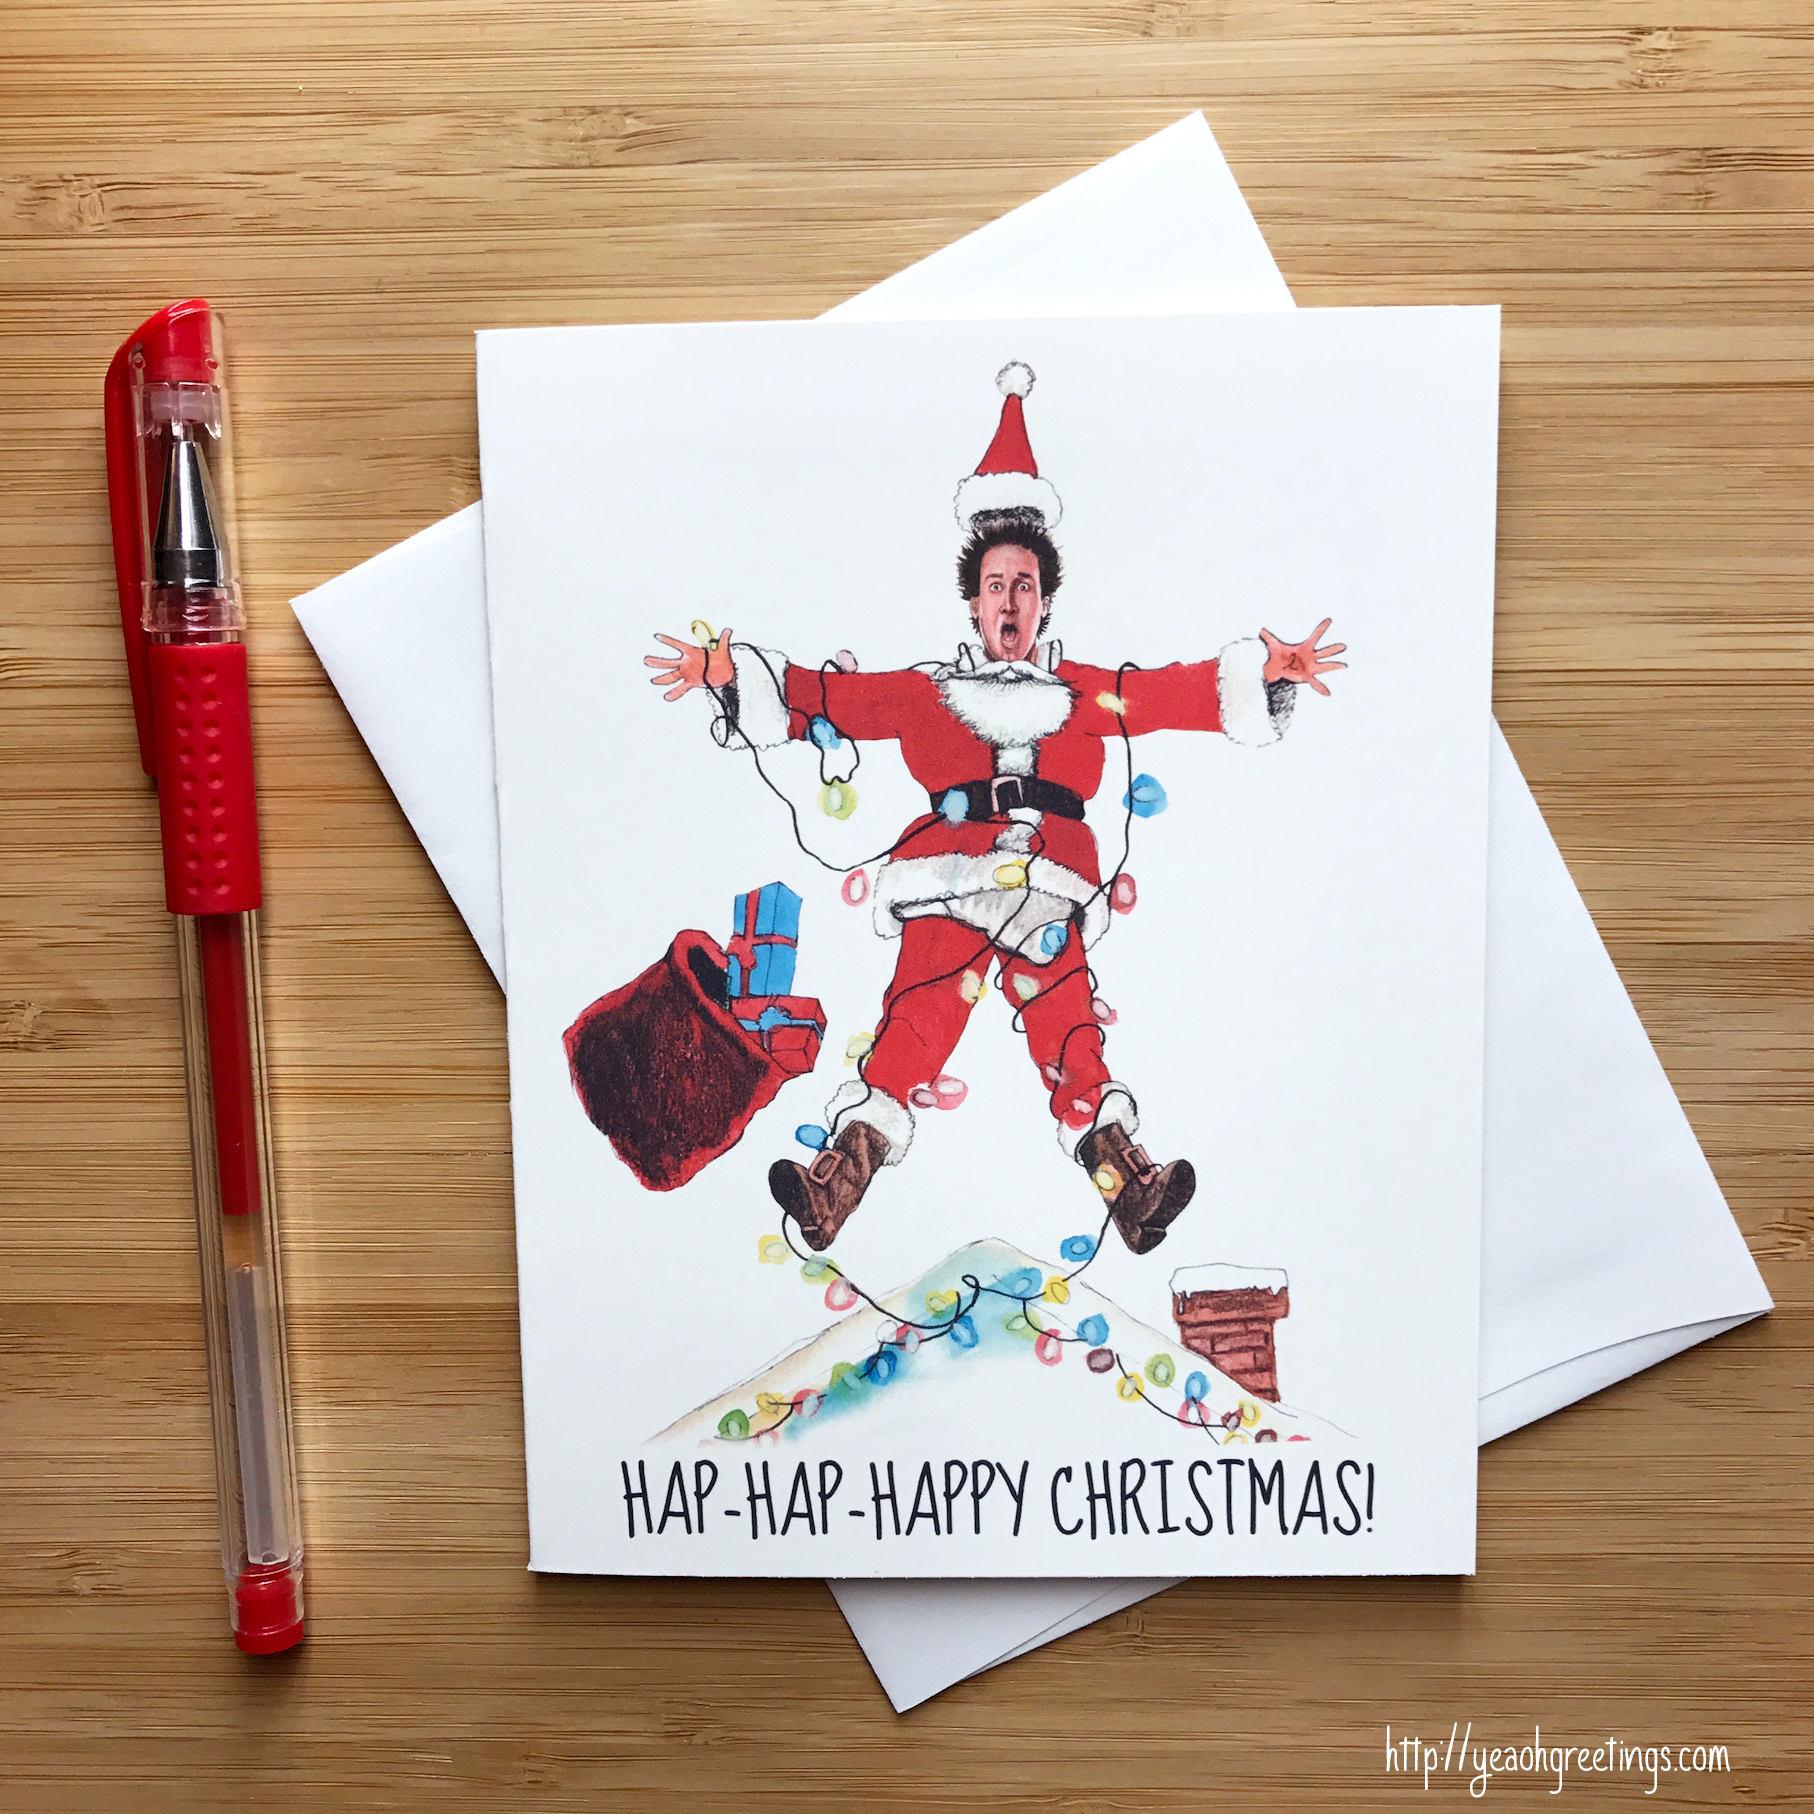 Christmas Vacation Santa Quotes: Hap Hap Happy Christmas Card Christmas Cards Funny Santa